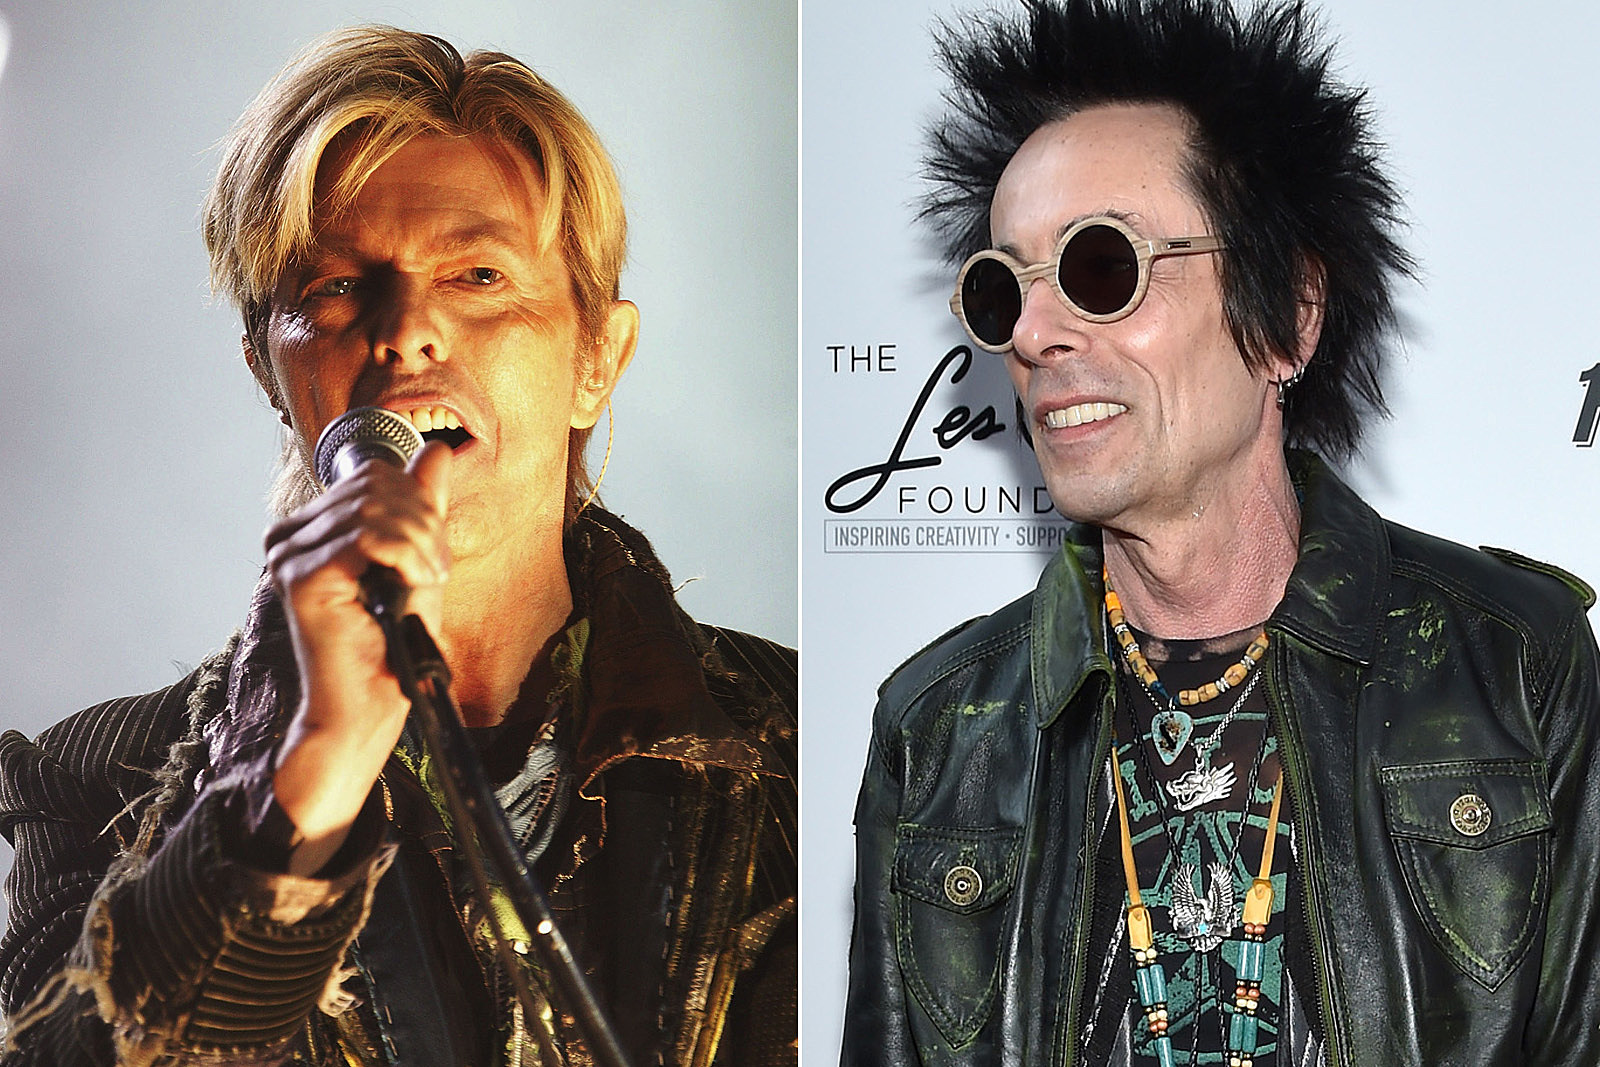 Earl Slick 'Wasn't a Bowie Fan' When He Got Life-Changing Gig